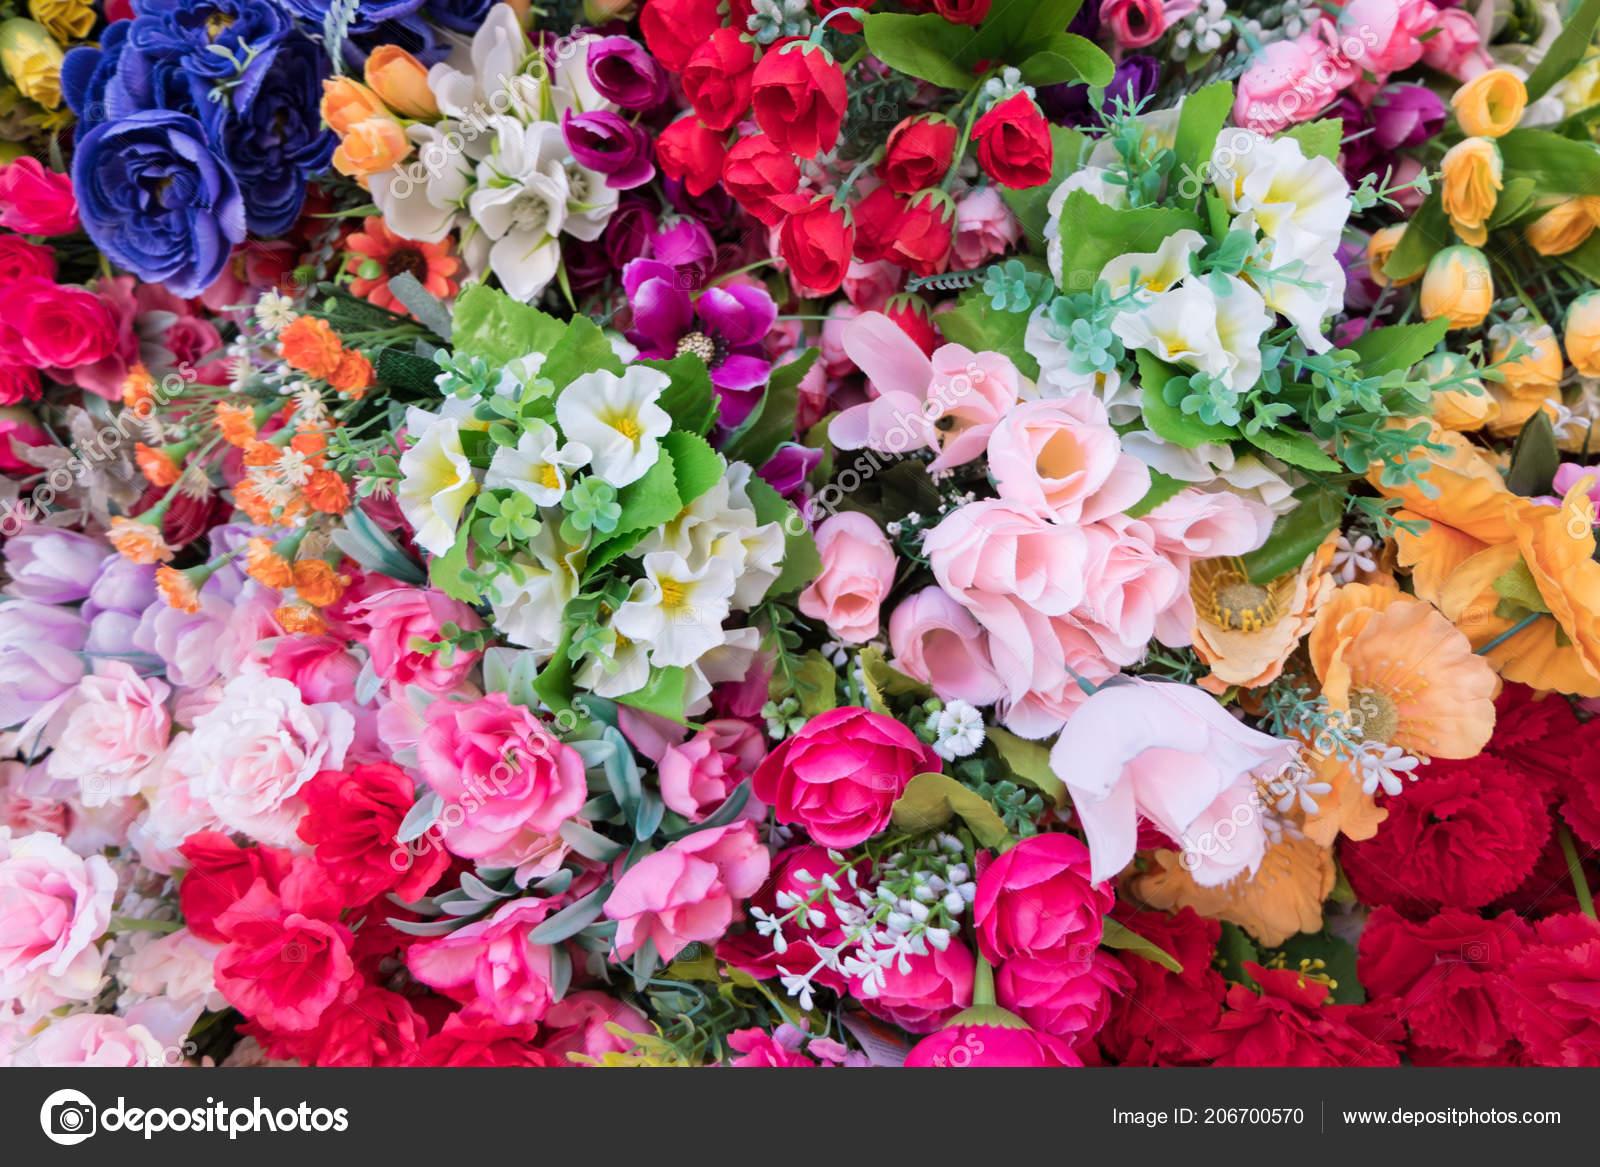 Pretty flower wallpaper backgrounds